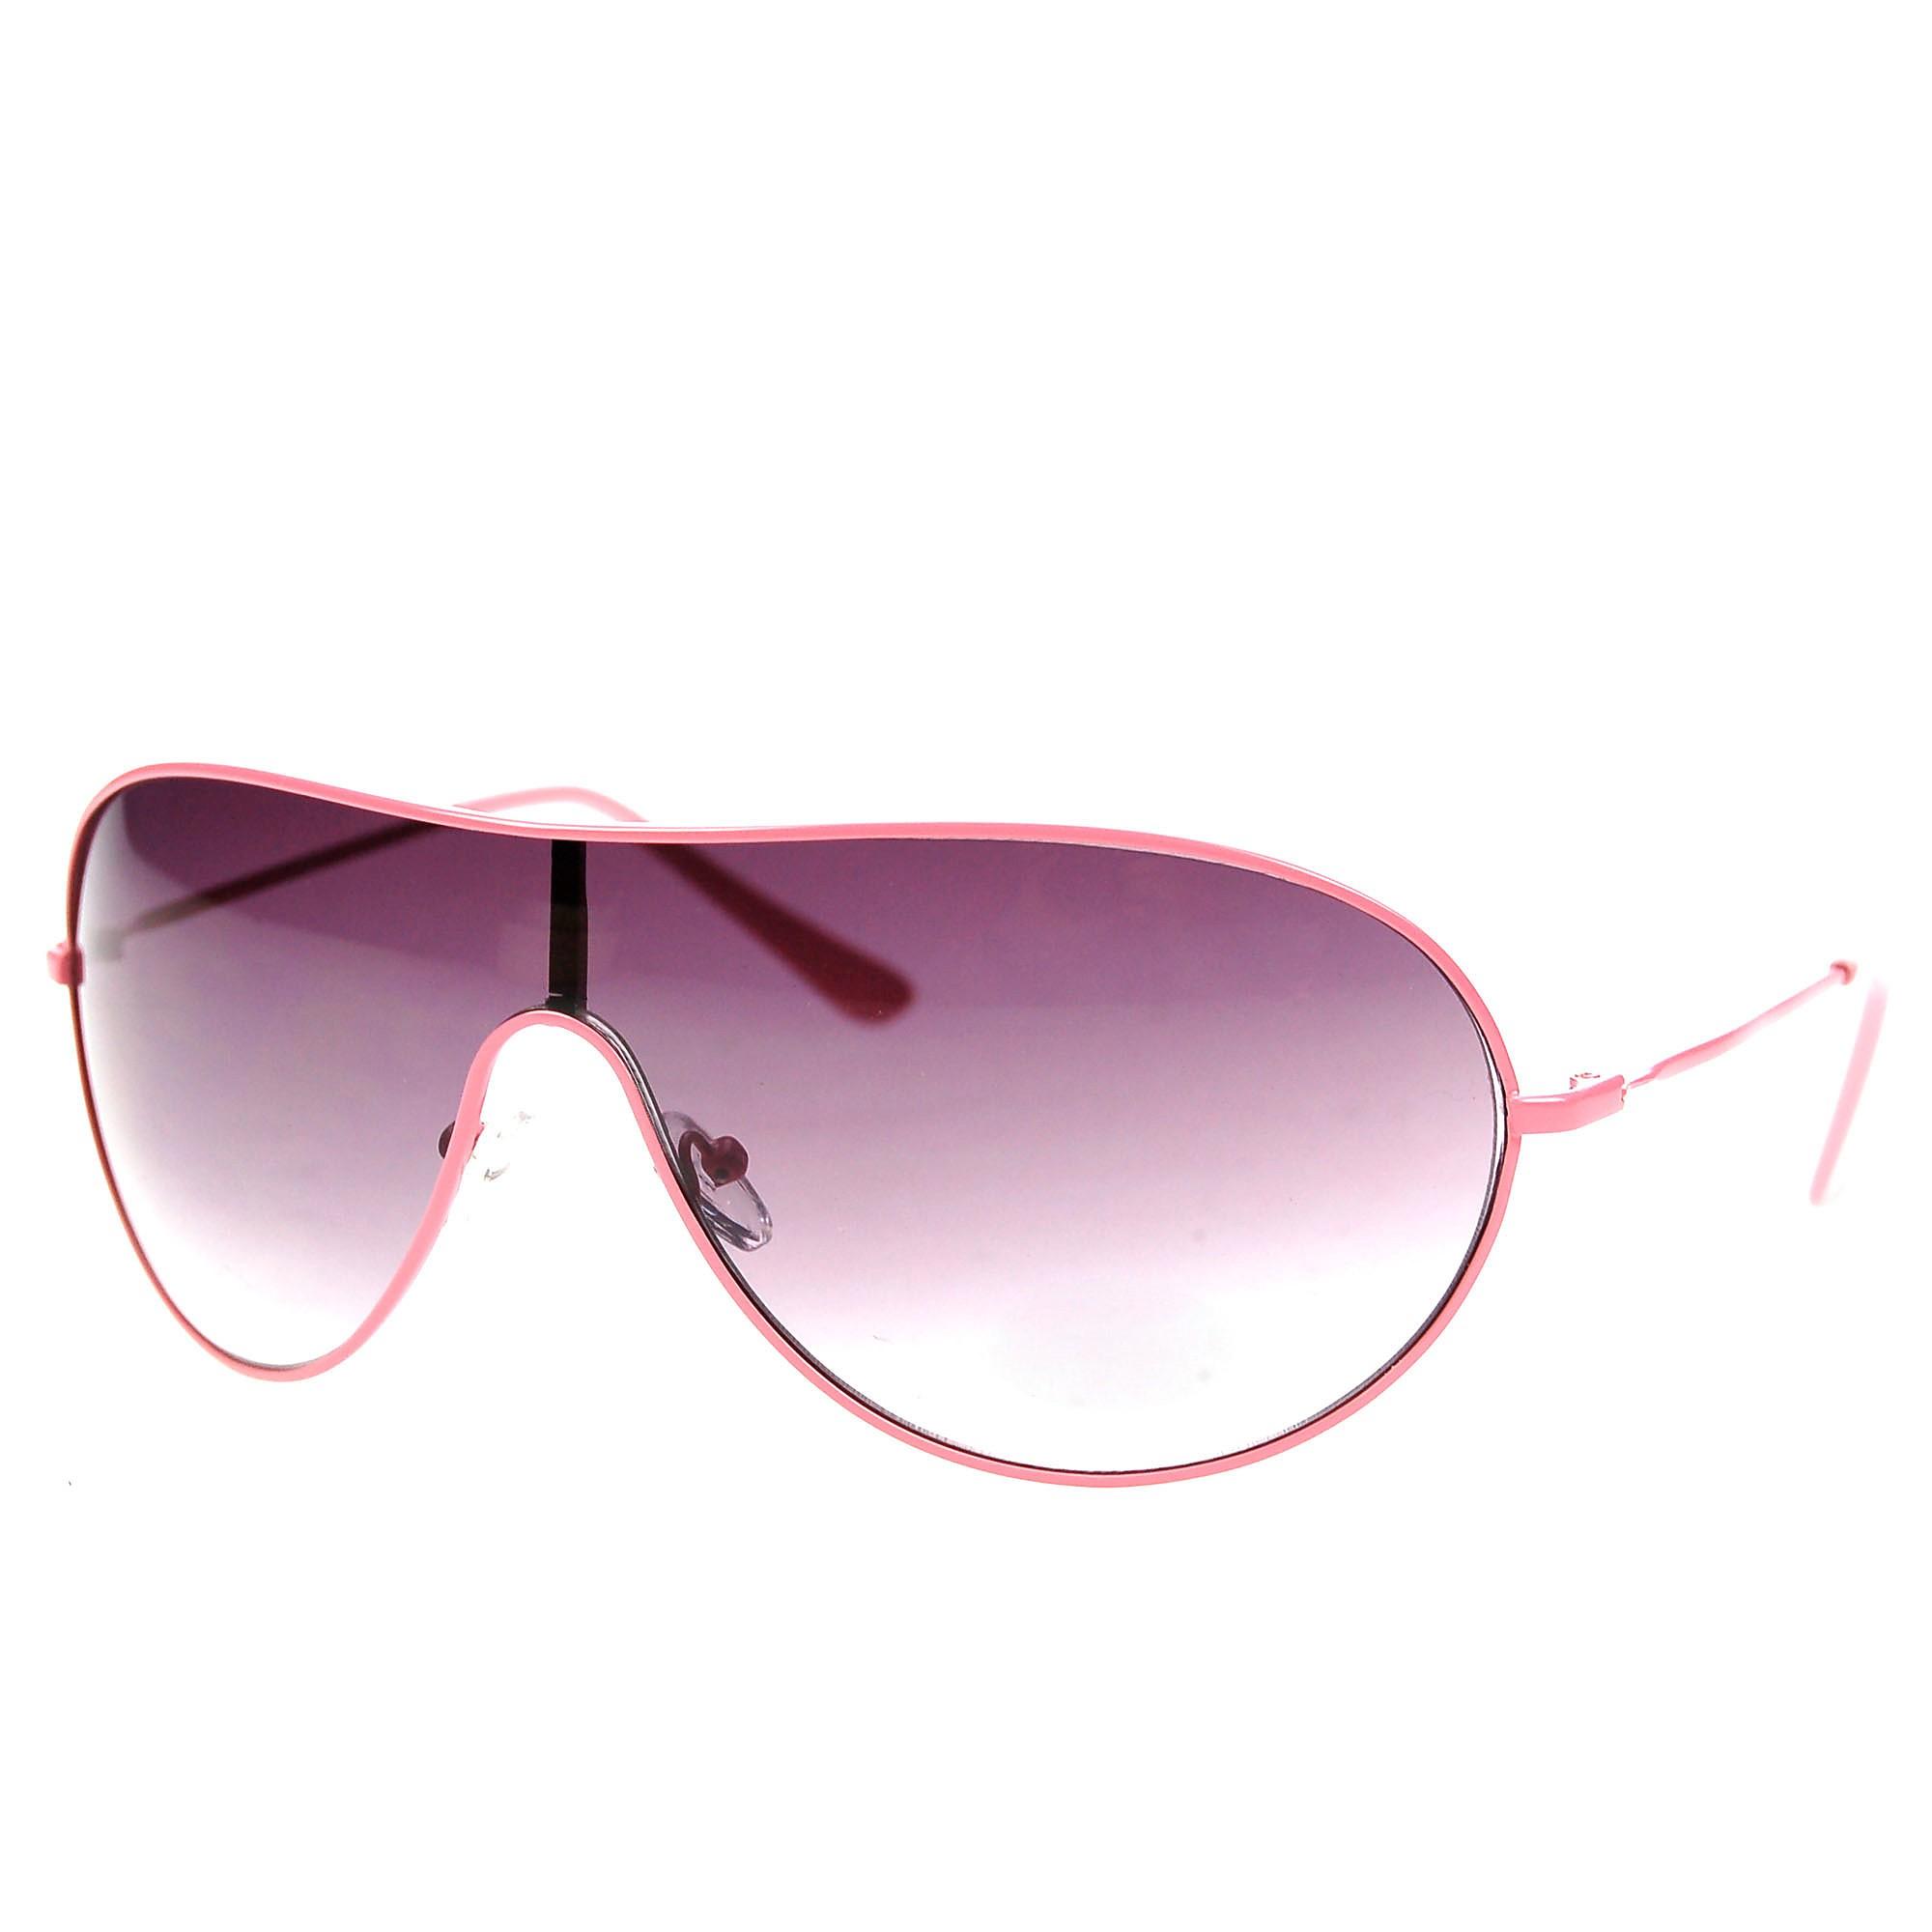 McKenzie Heather Sunglasses